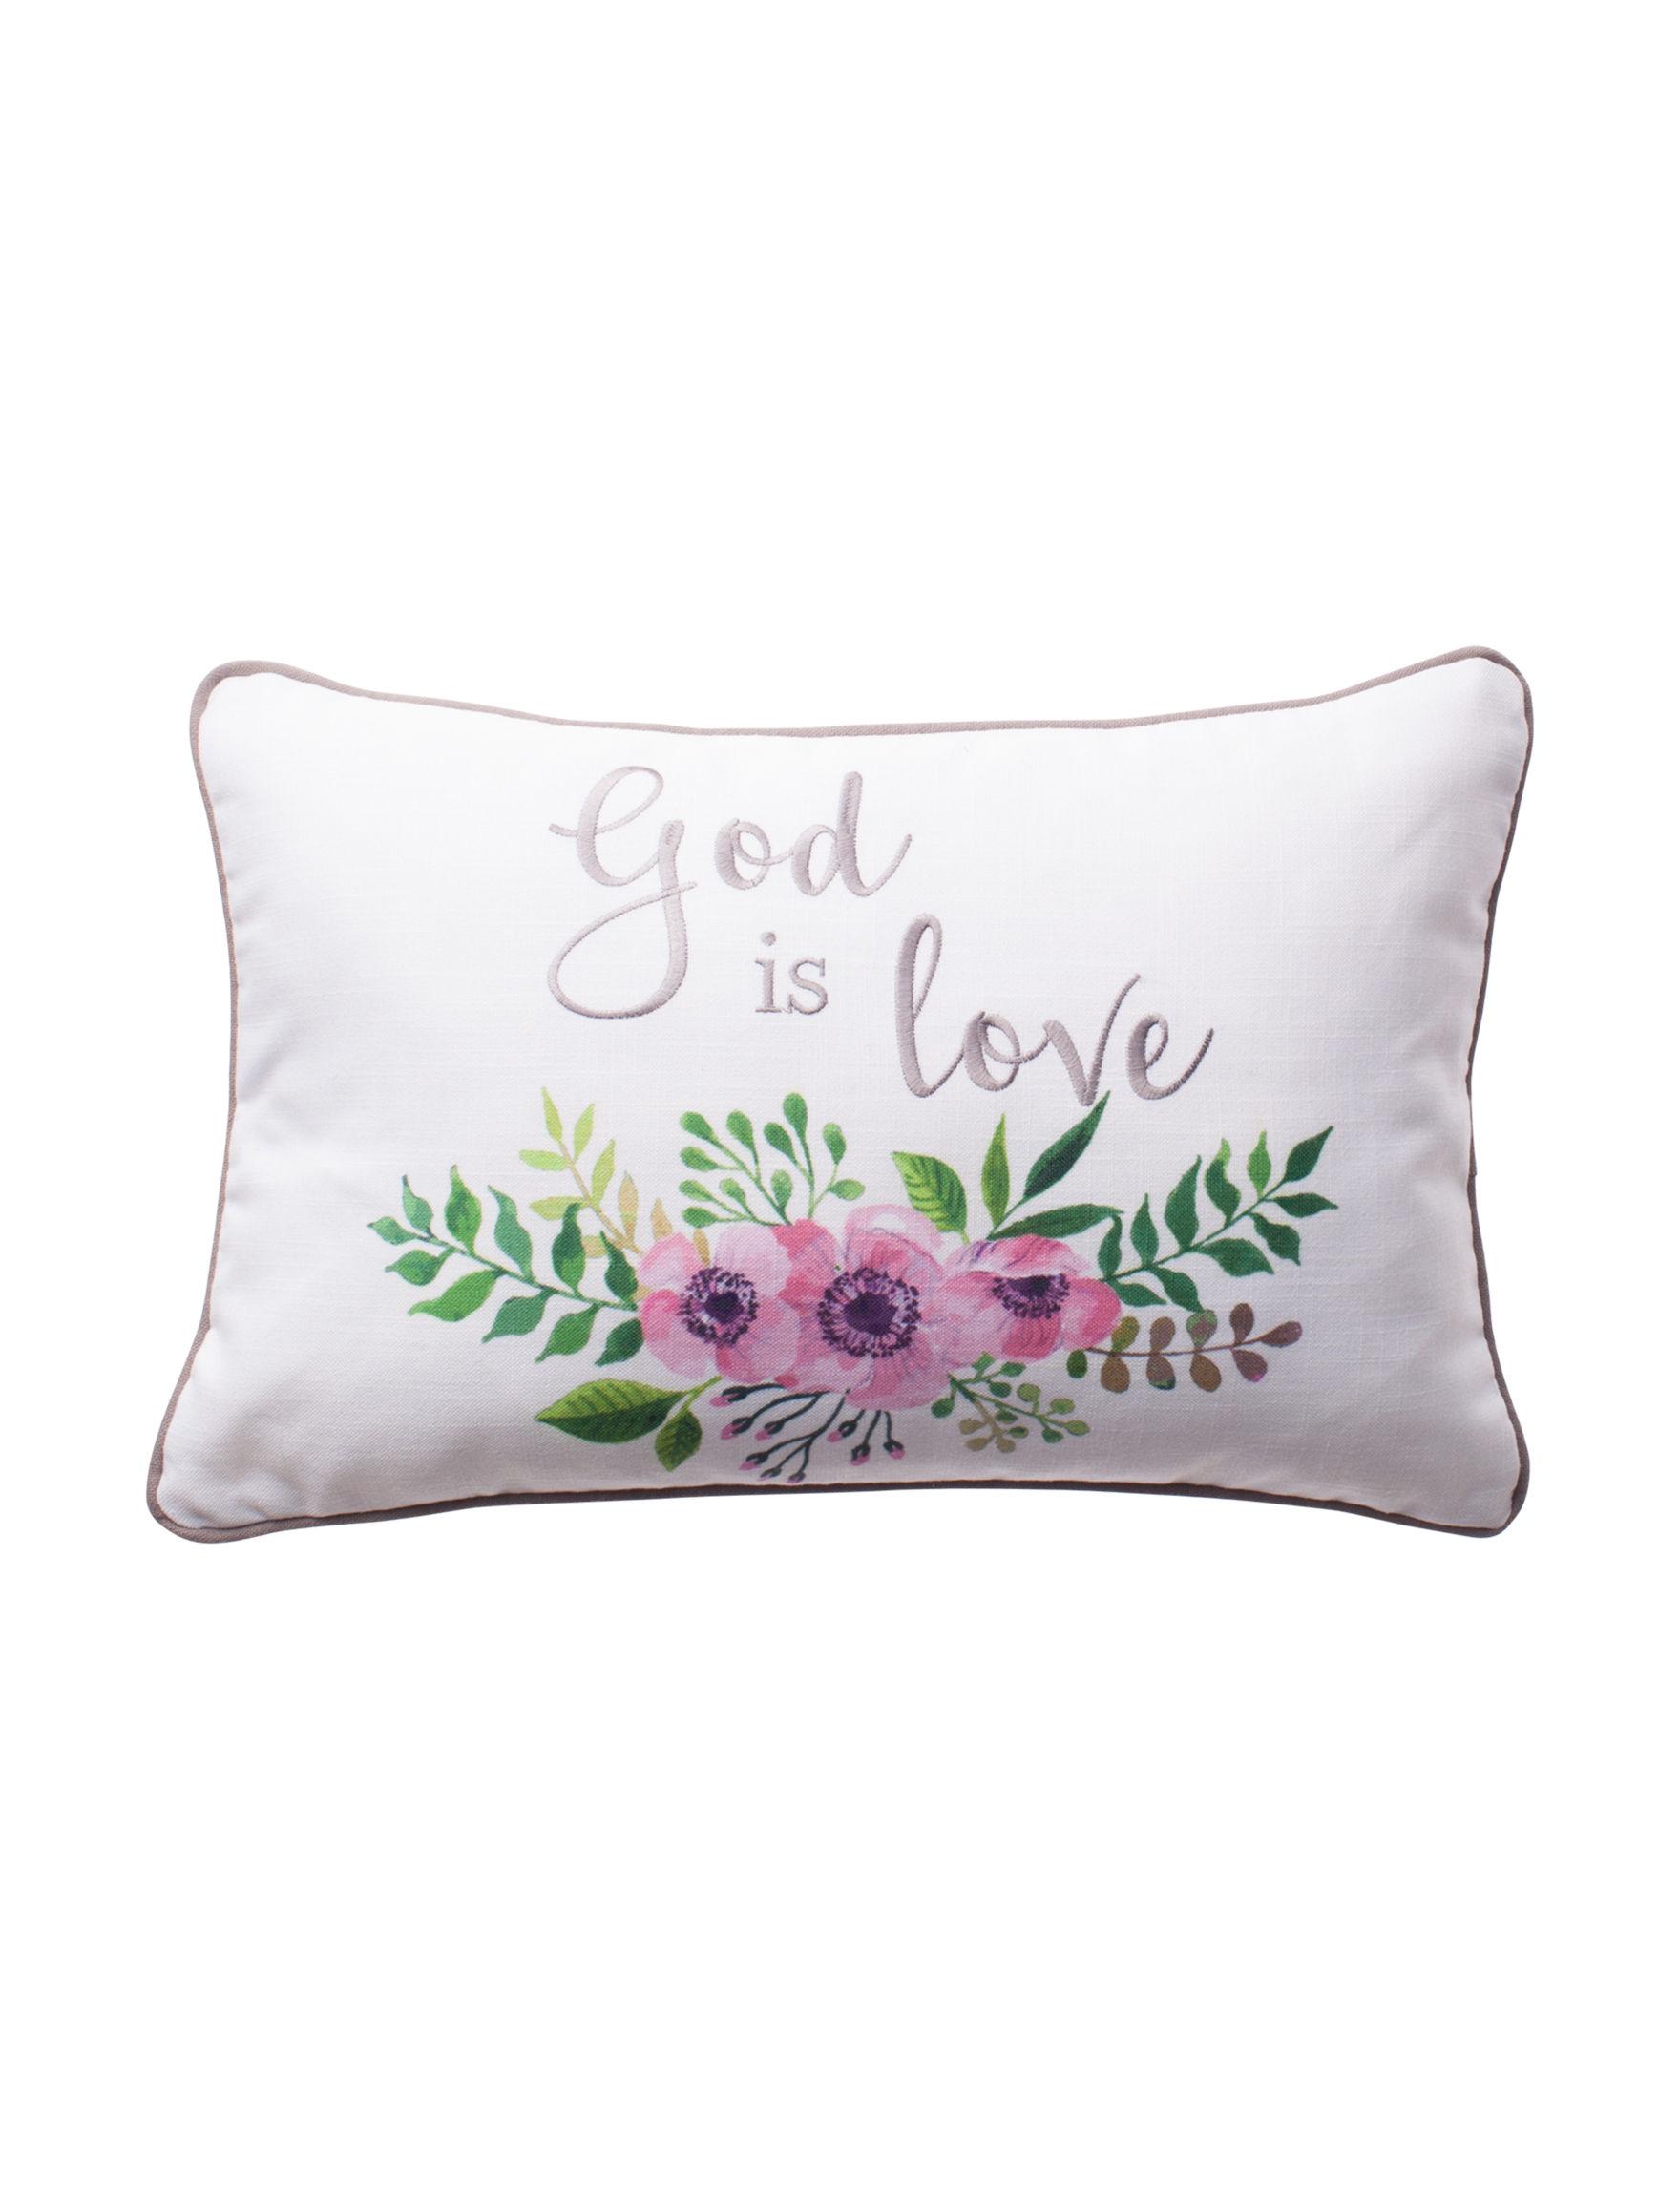 Deco  Decorative Pillows